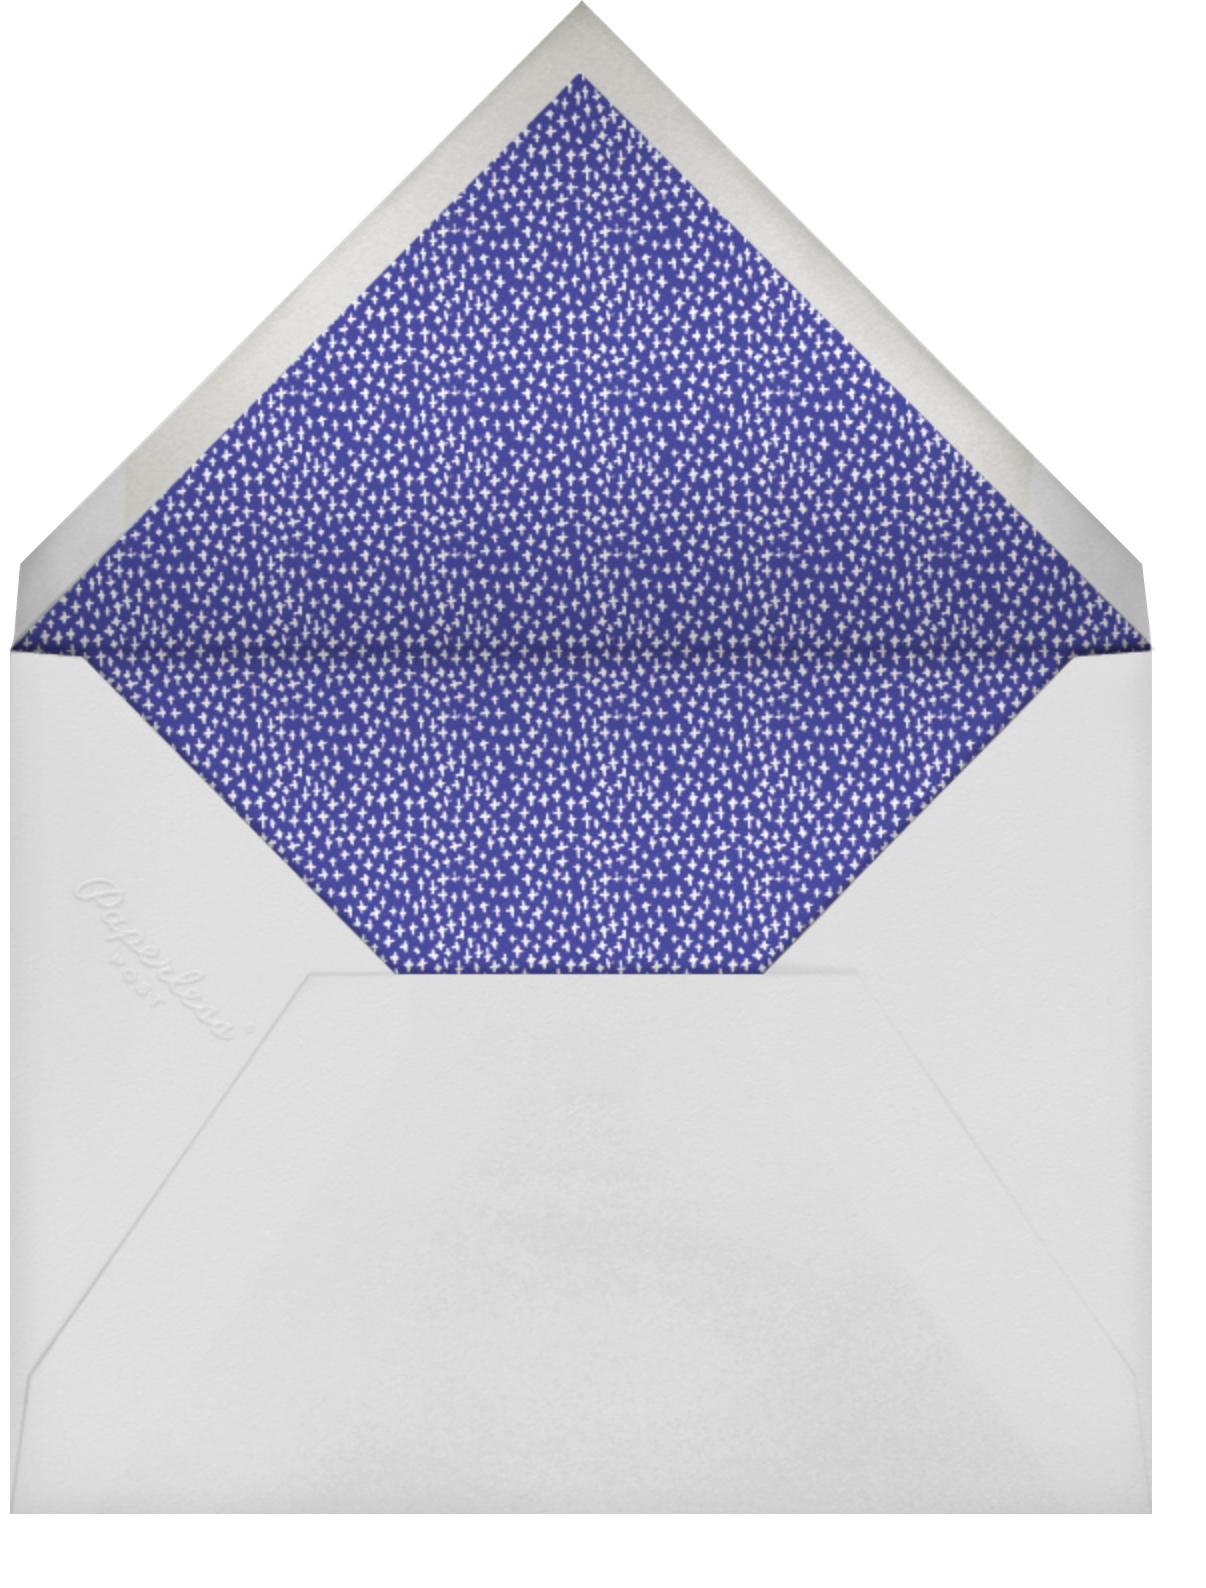 Stable Table - Mr. Boddington's Studio - Thinking of you - envelope back